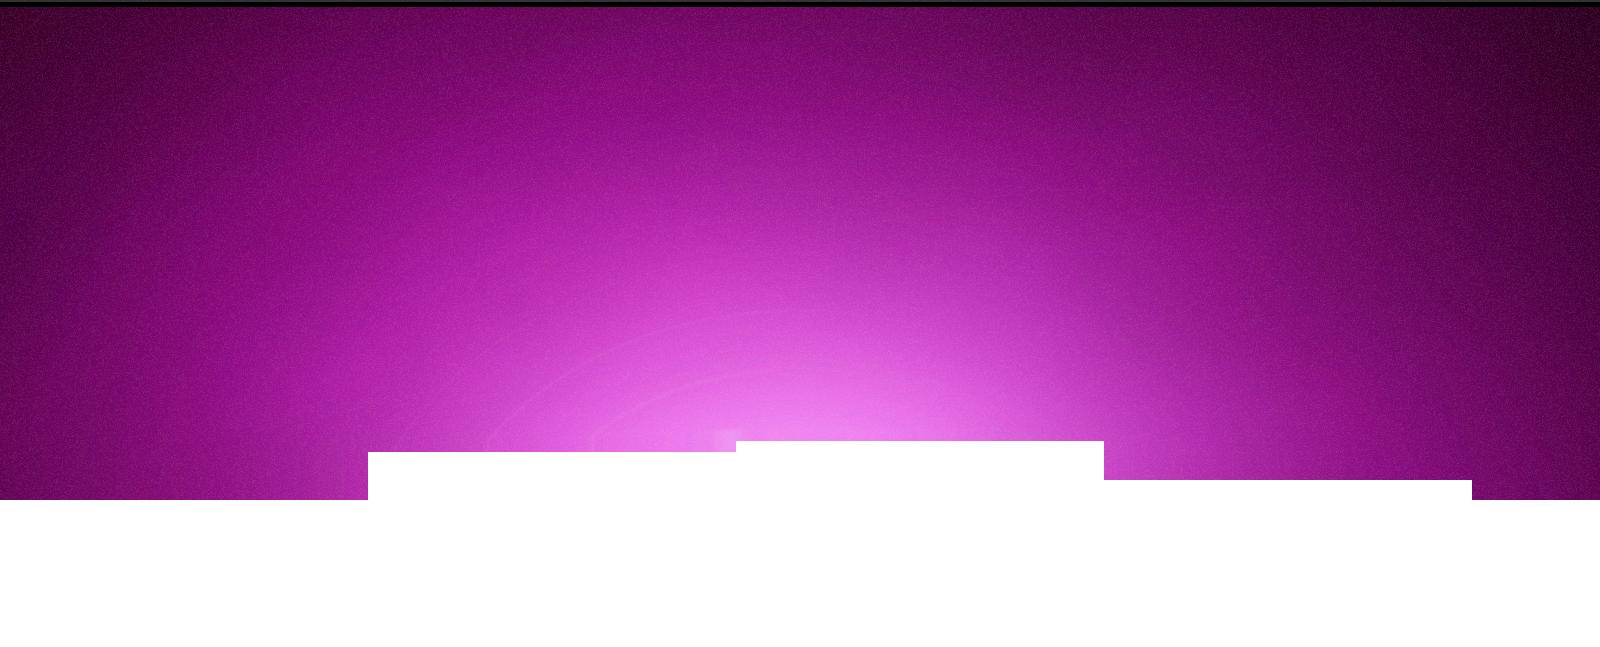 bg-purple-d